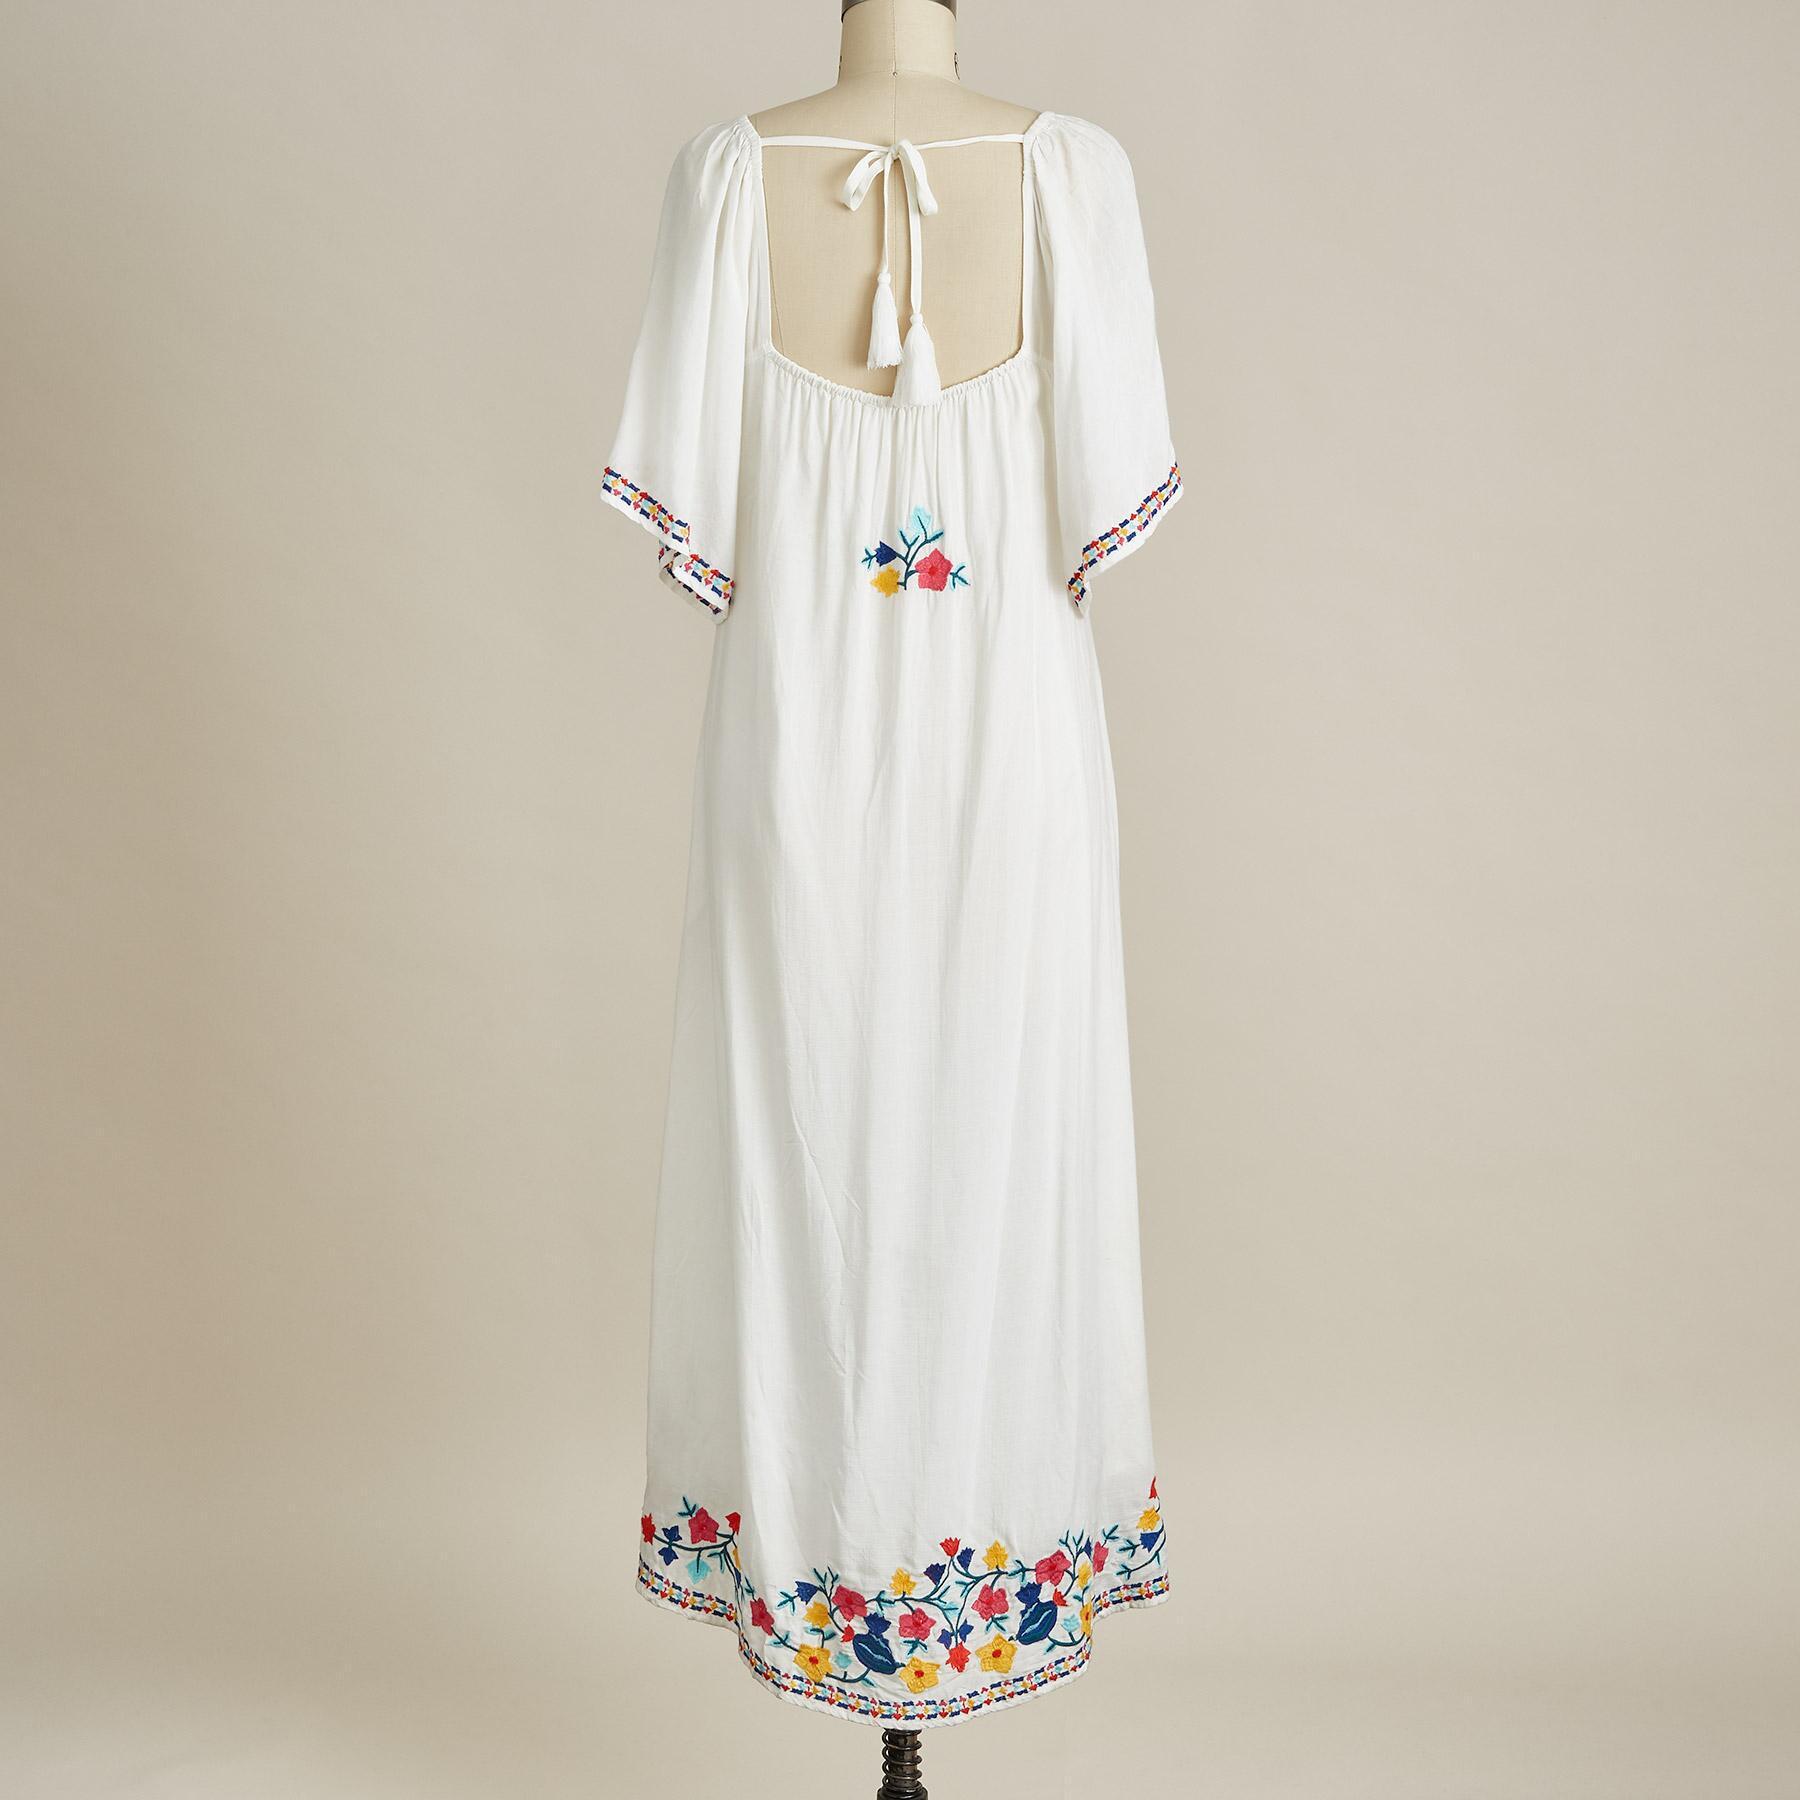 LIVIA BLOOM DRESS - PETITES: View 3